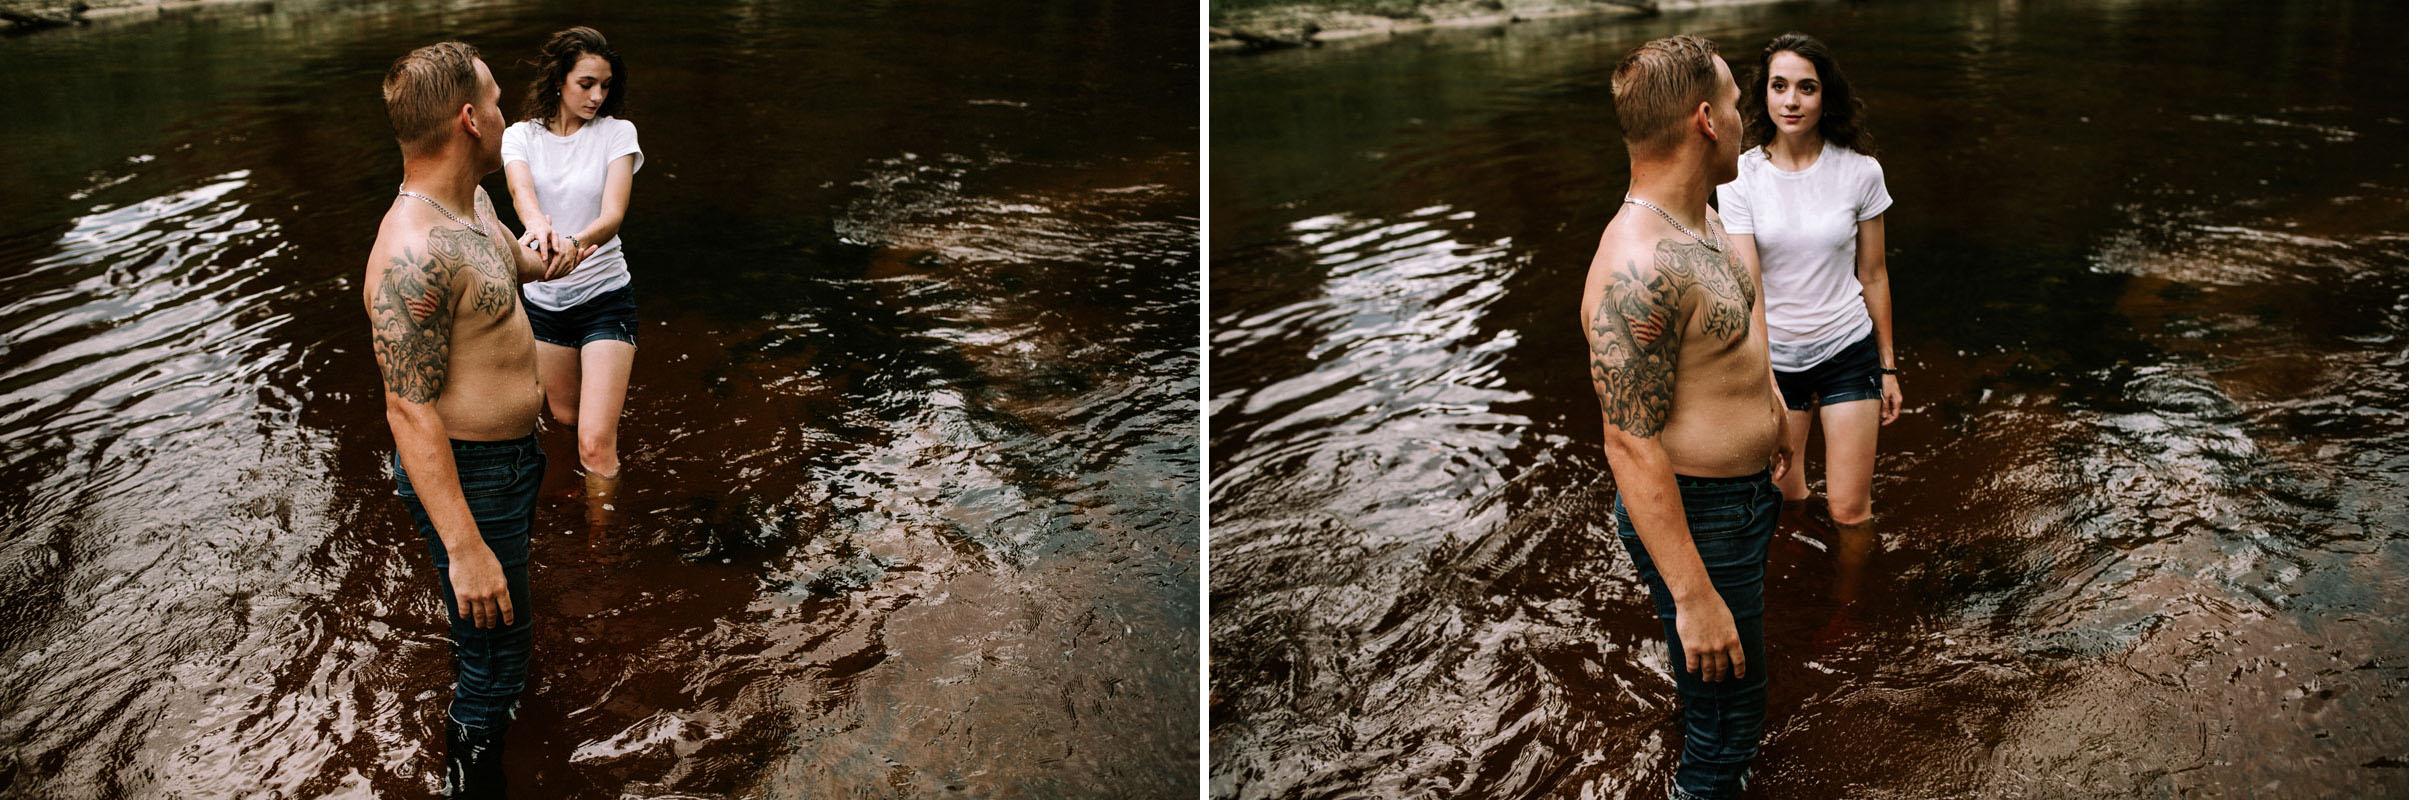 Intimate-couple-river-session-valdosta-wedding-photographers (69).jpg